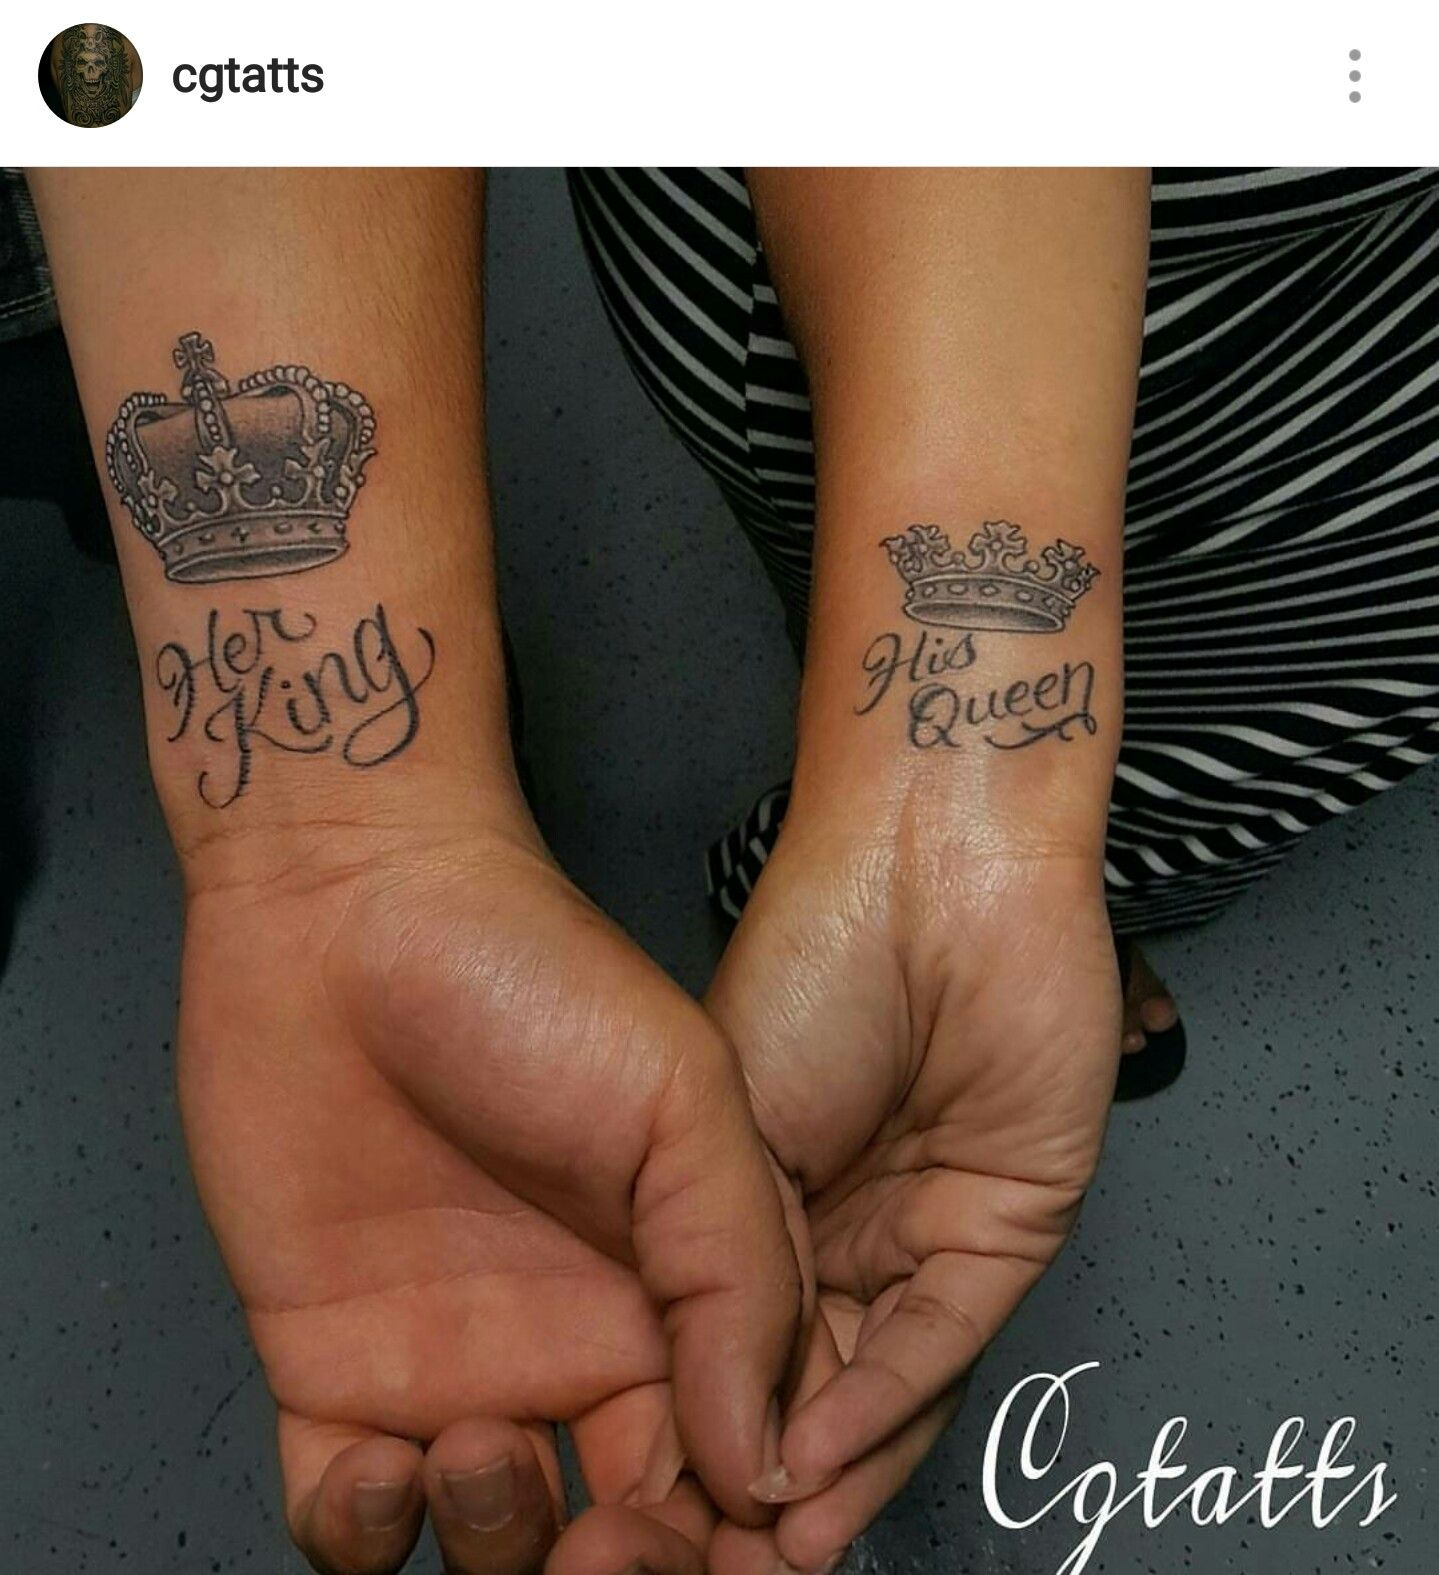 8f3fd7624212b Her King His queen tattoos | tatts | Queen tattoo, King tattoos, Tattoos